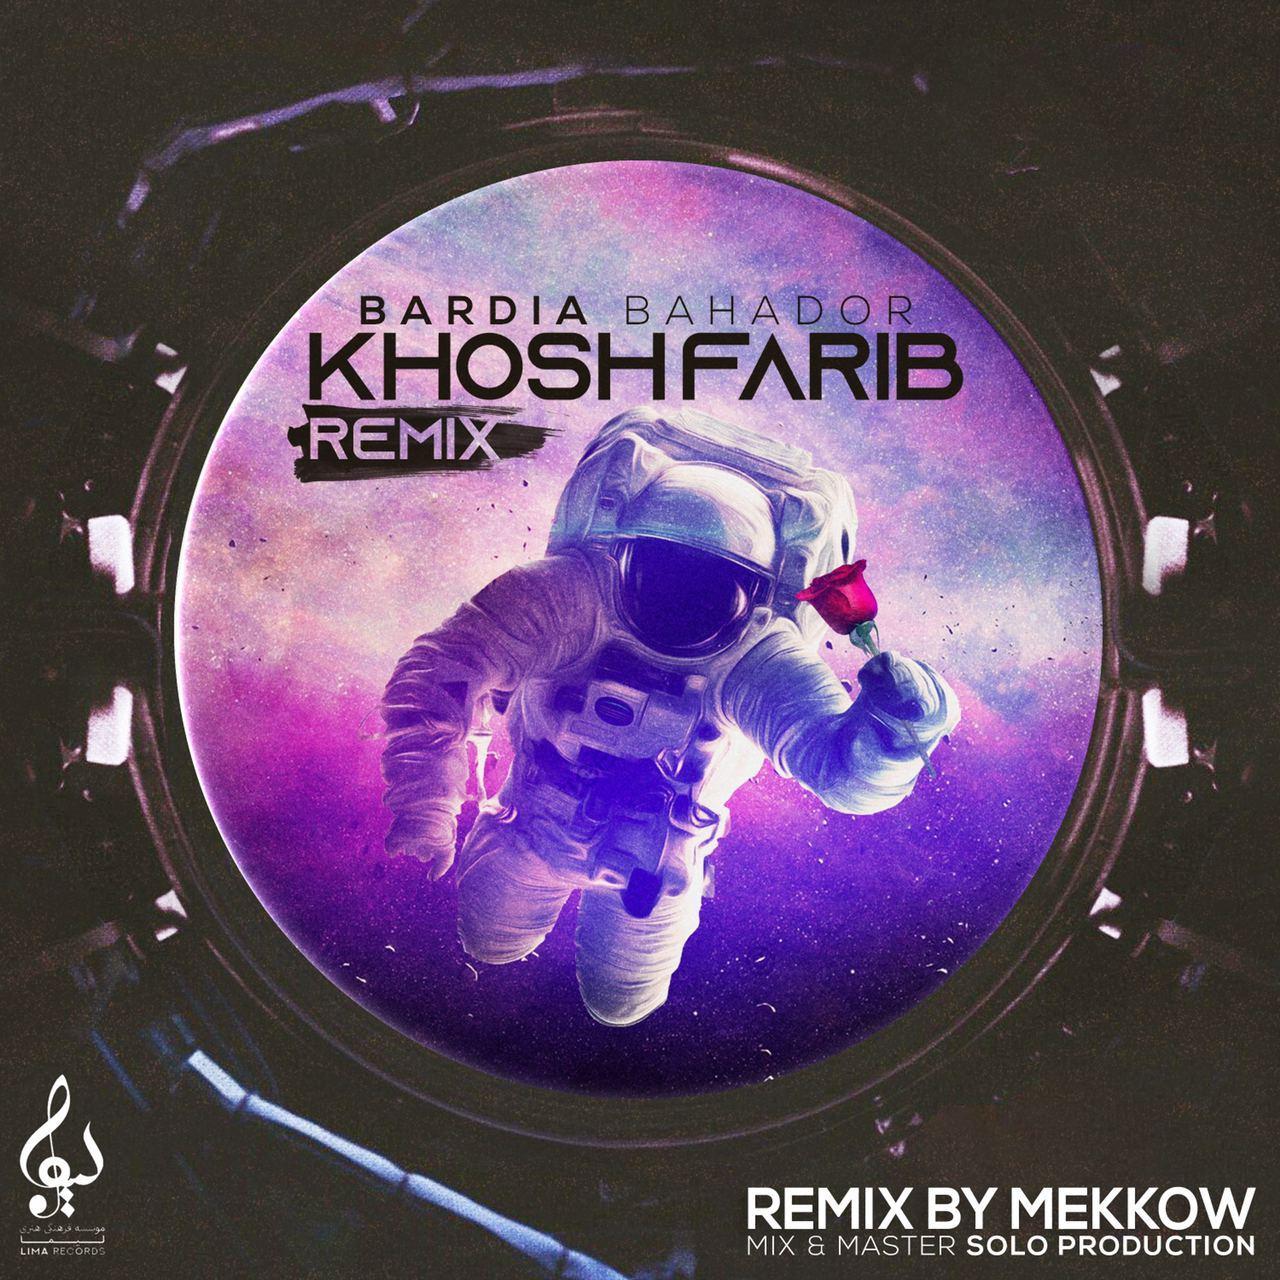 Bardia Bahador – Khoshfarib (Remix)